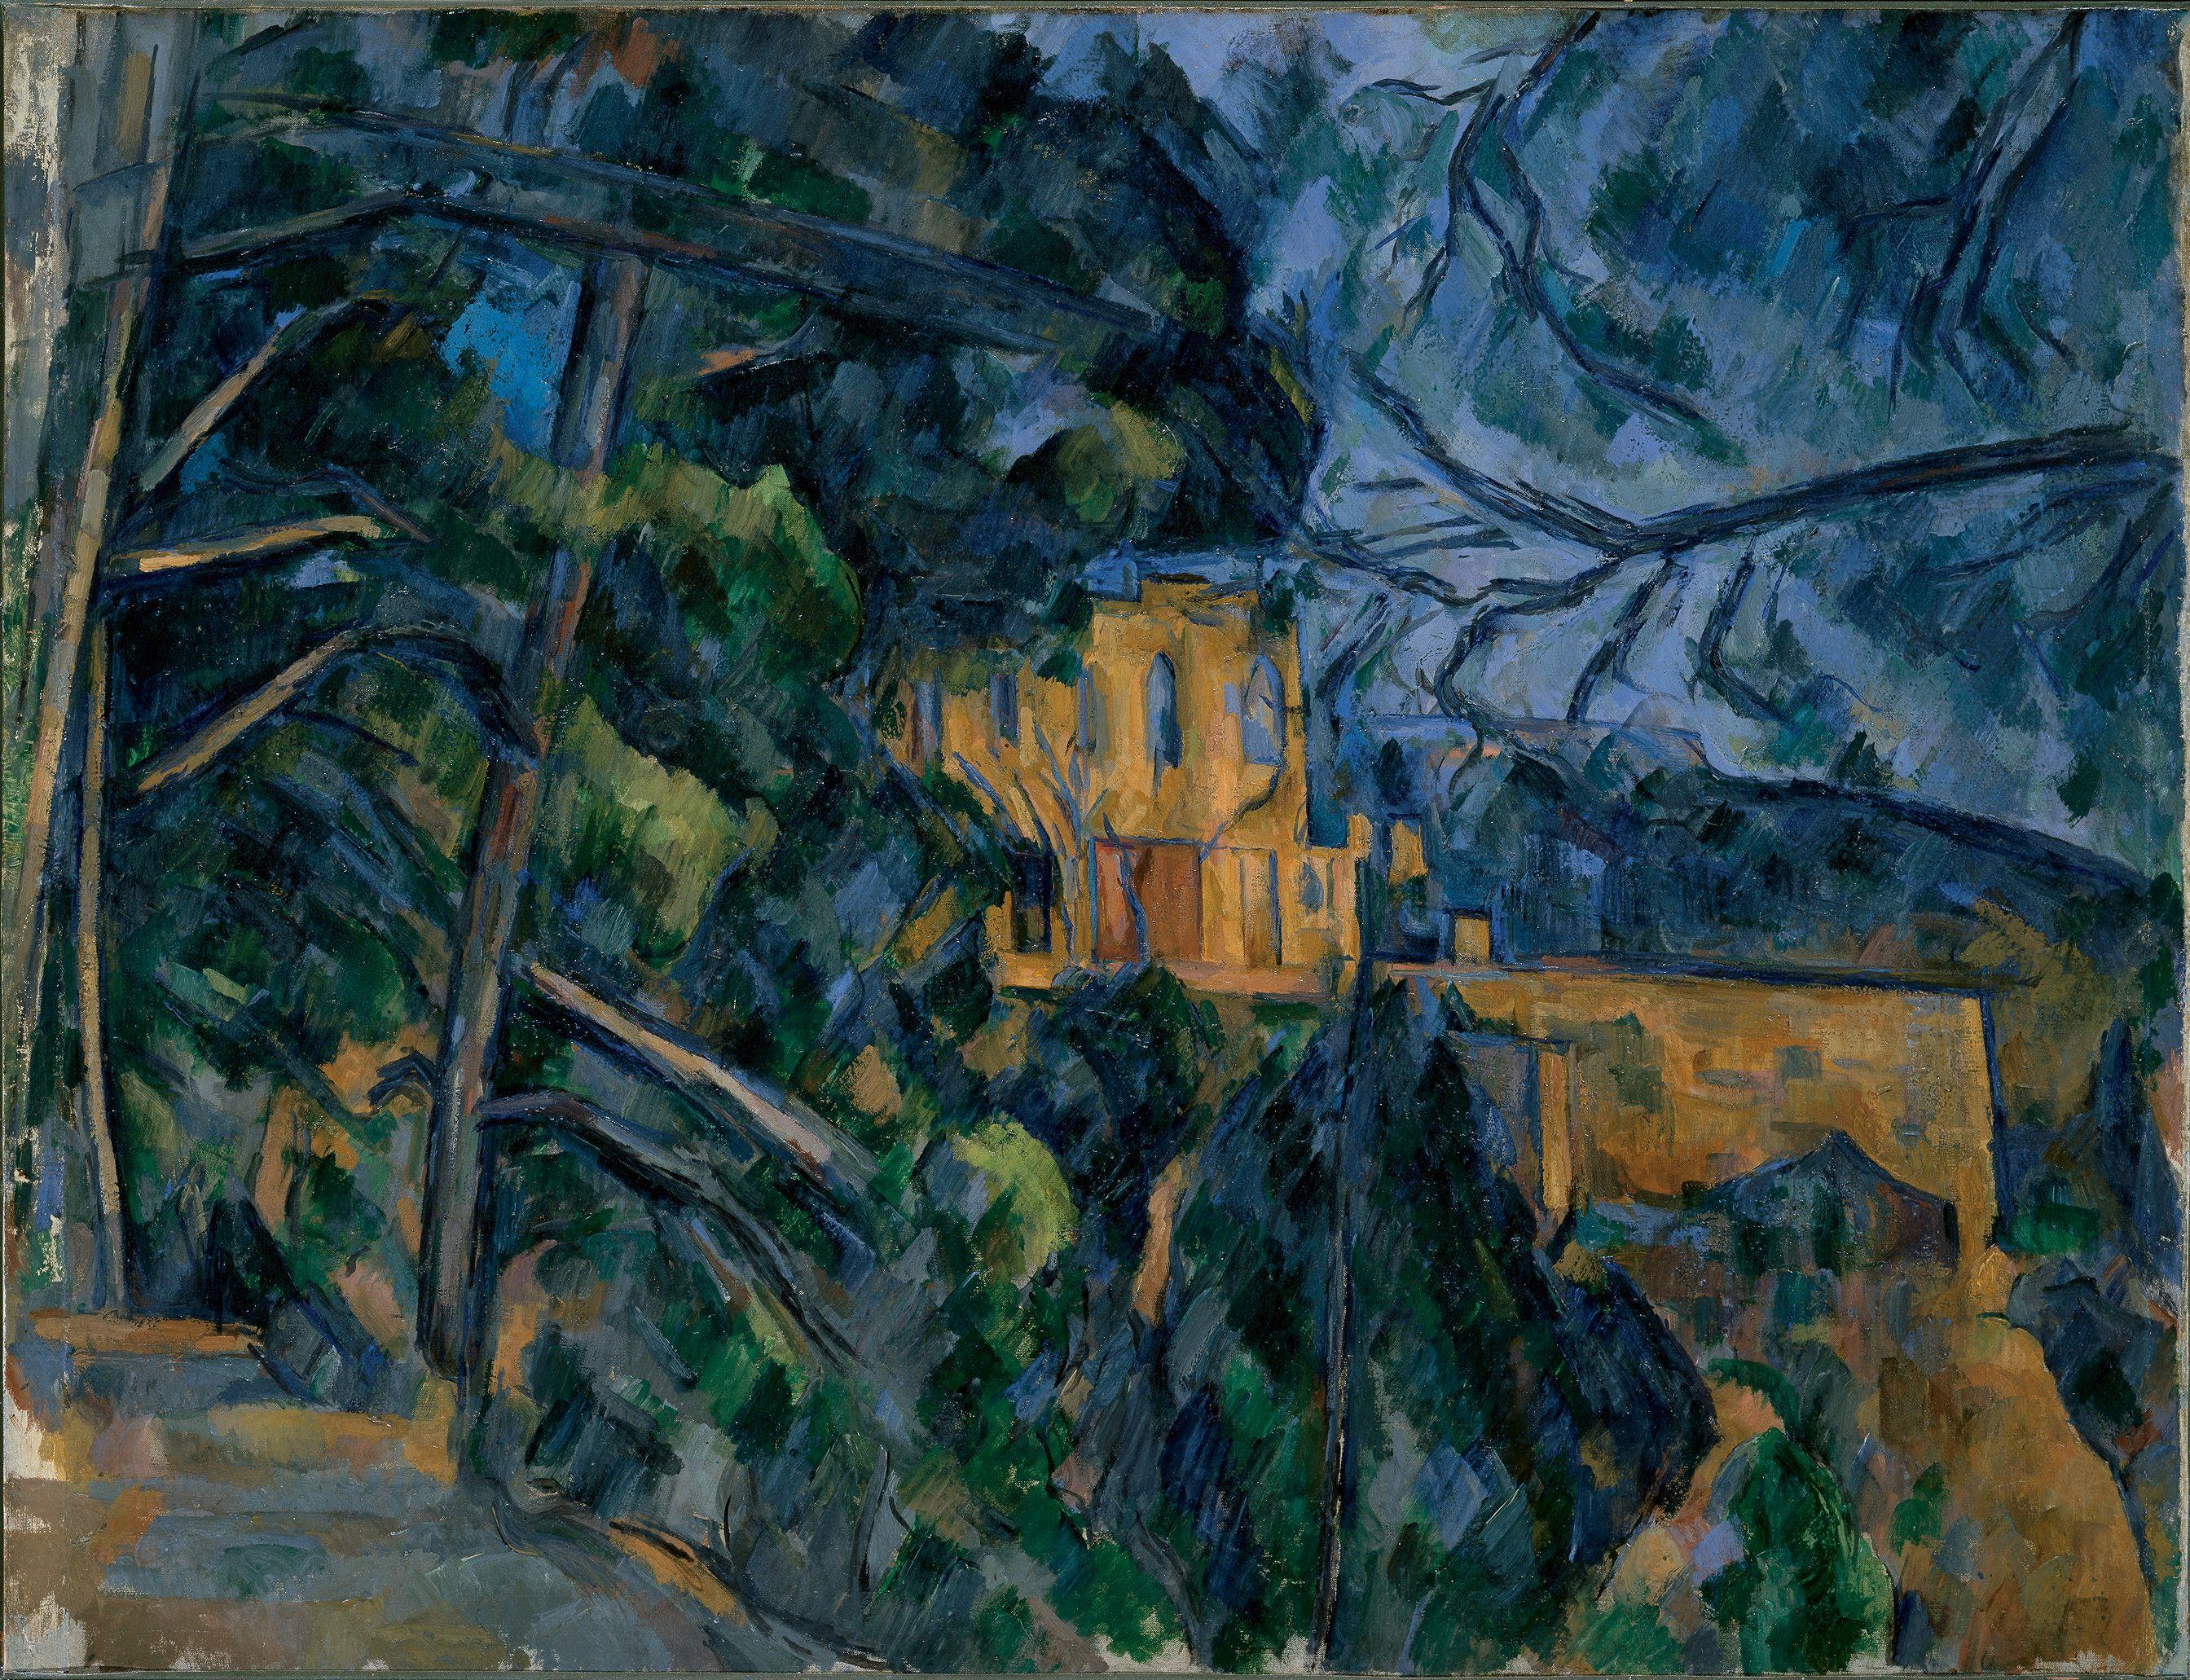 Filechâteau Noir Par Paul Cézanne National Gallery Of Art